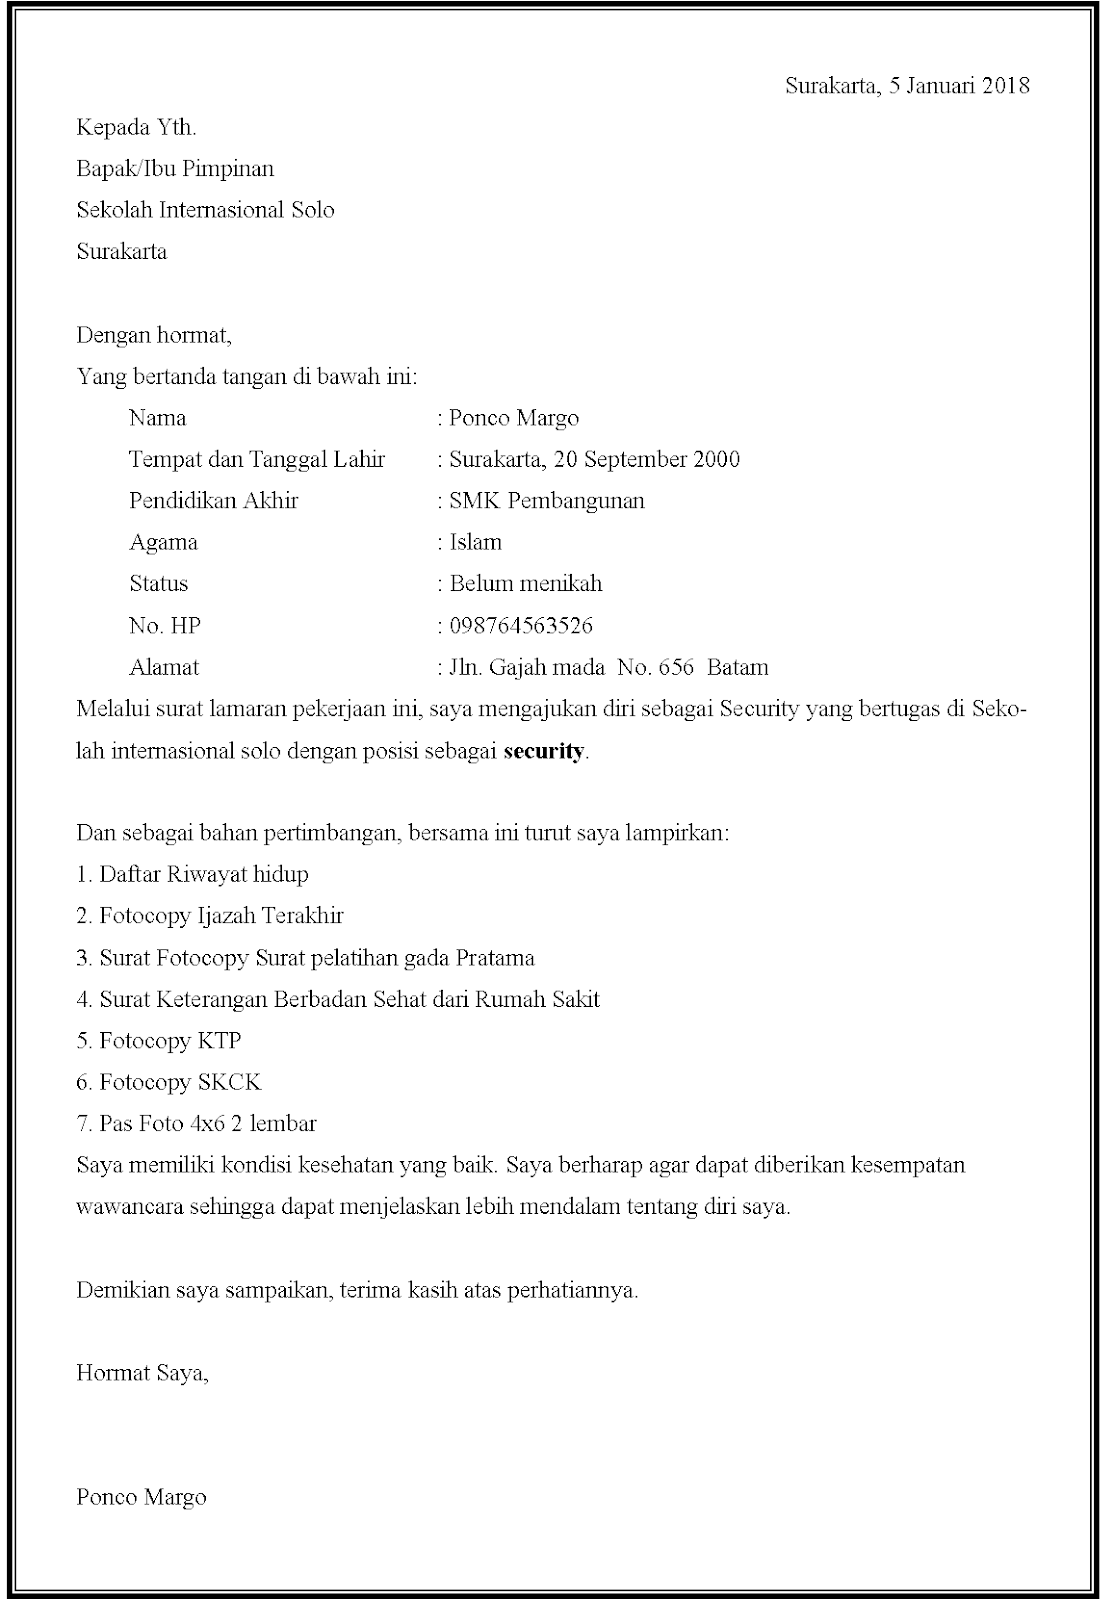 Contoh surat lamaran kerja security di sekolah